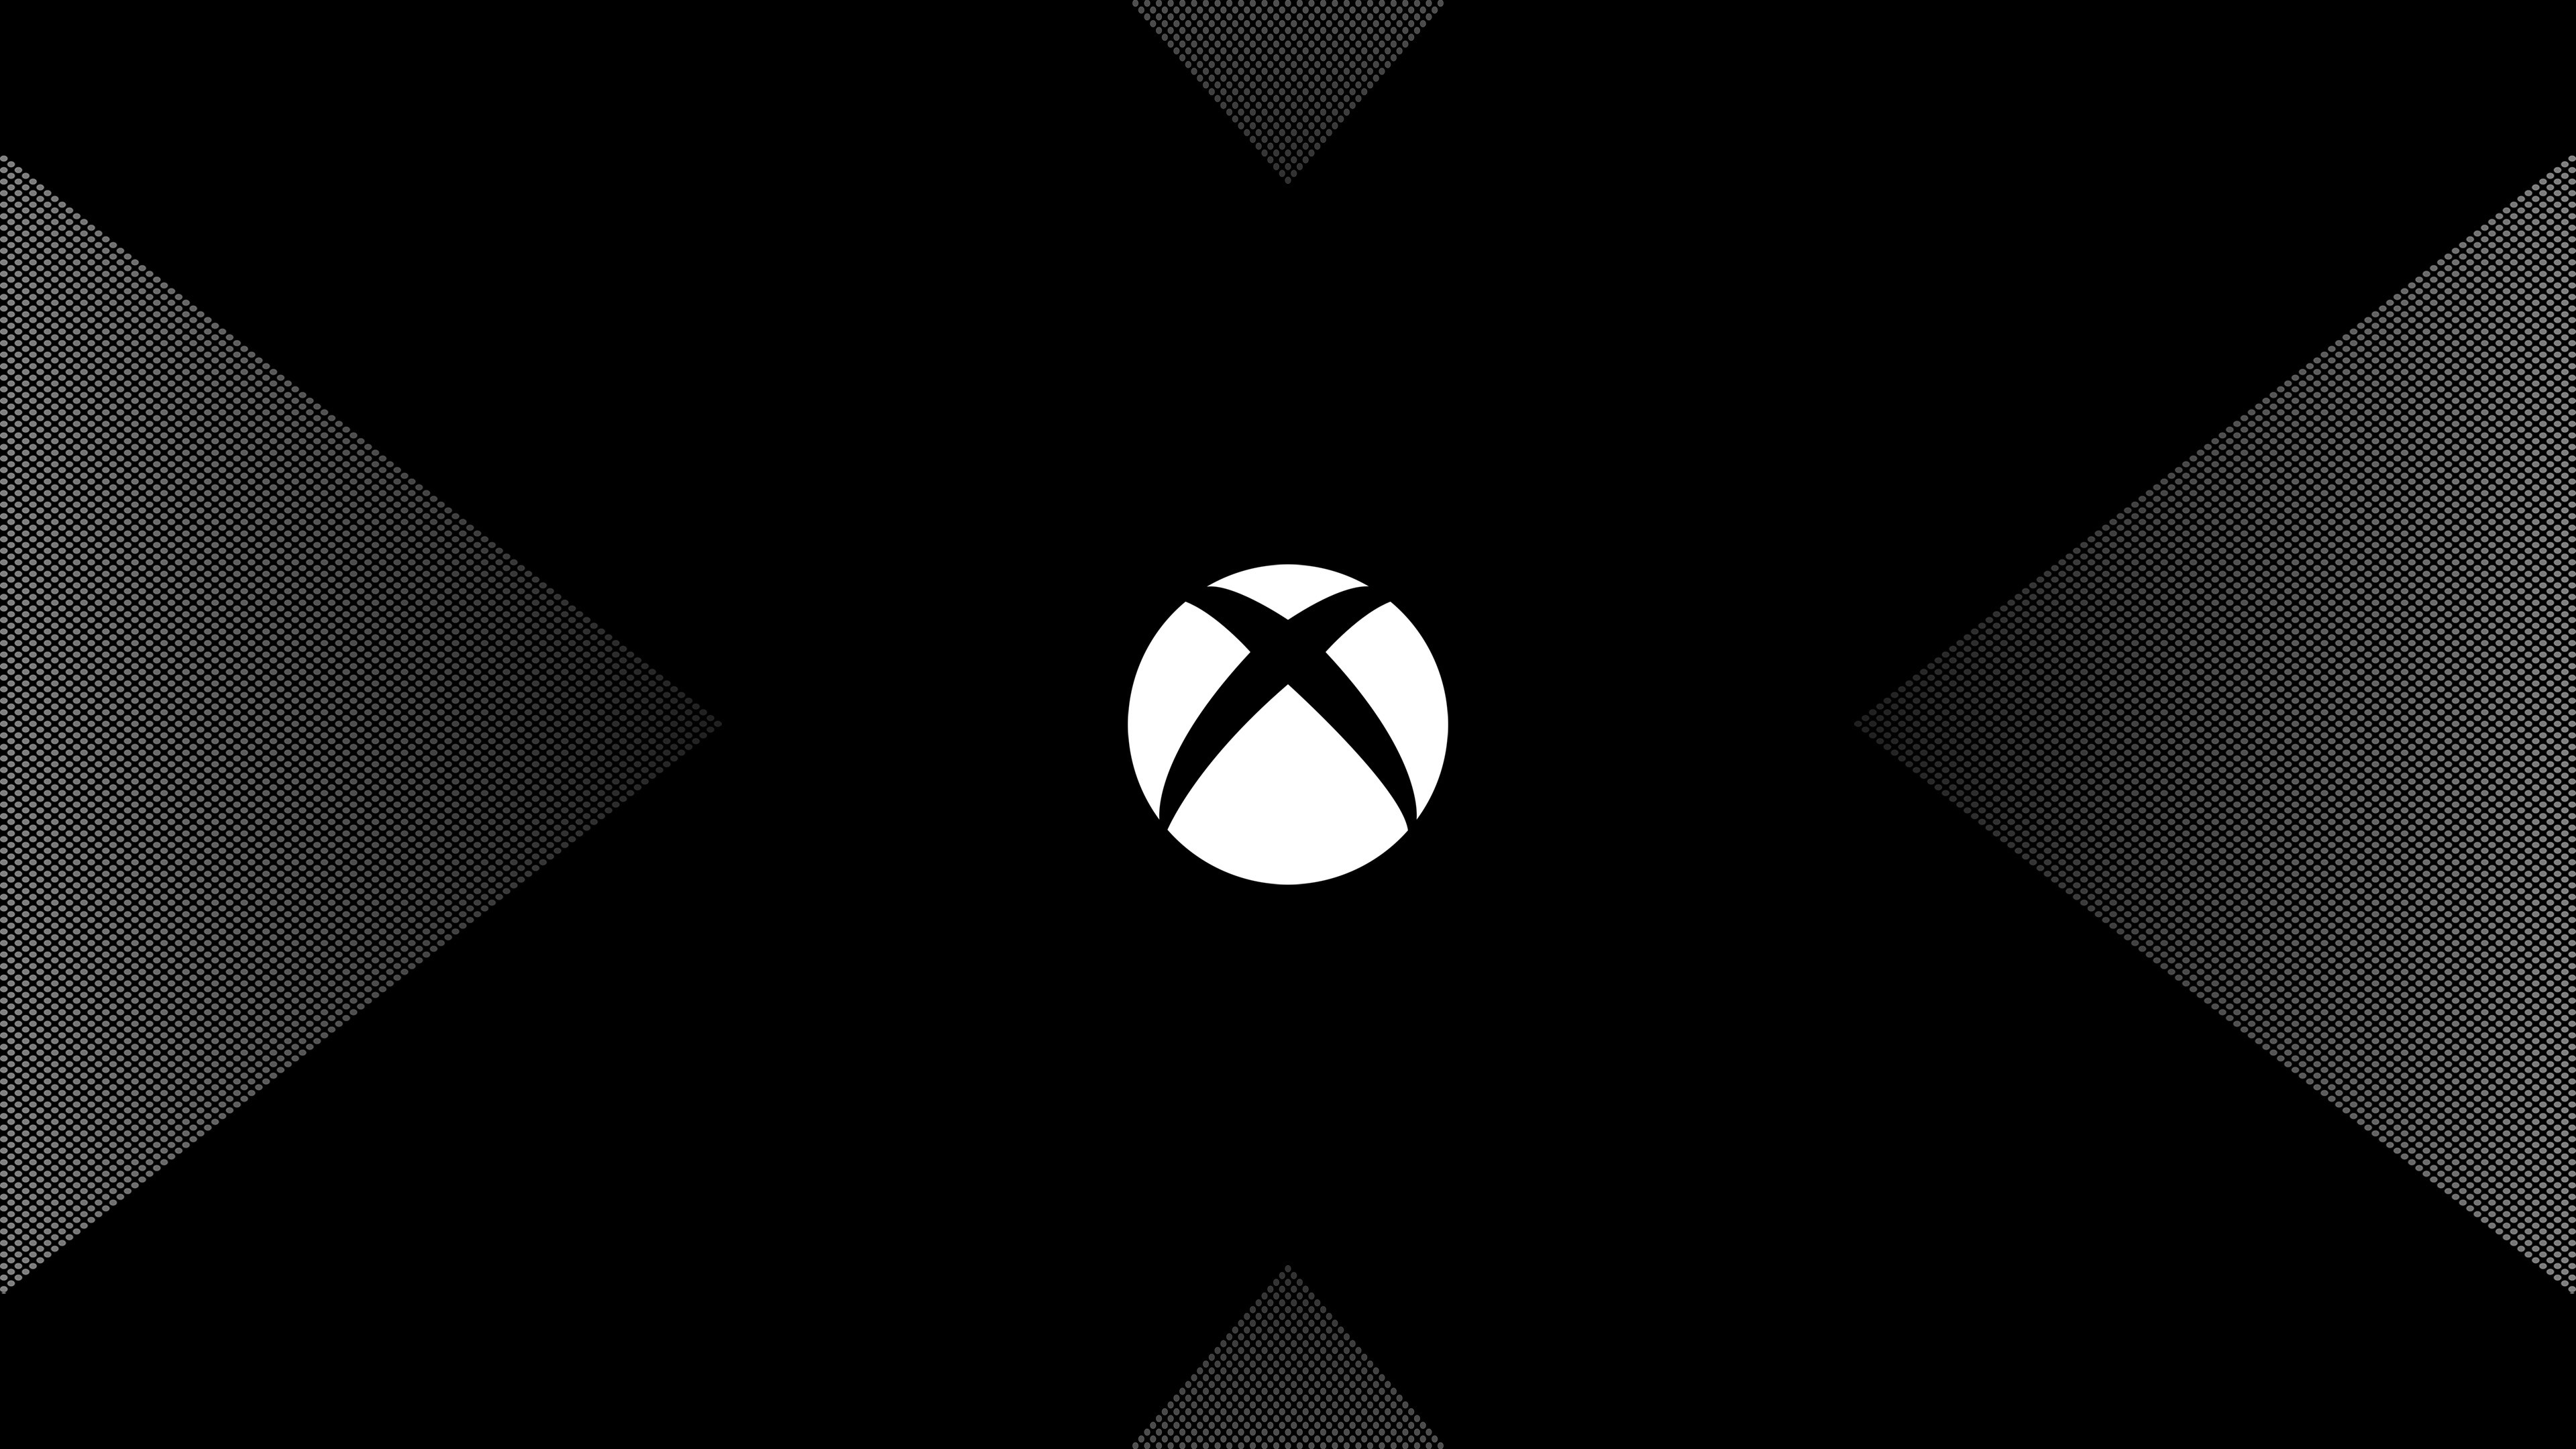 Xbox 360 Logo Black Background